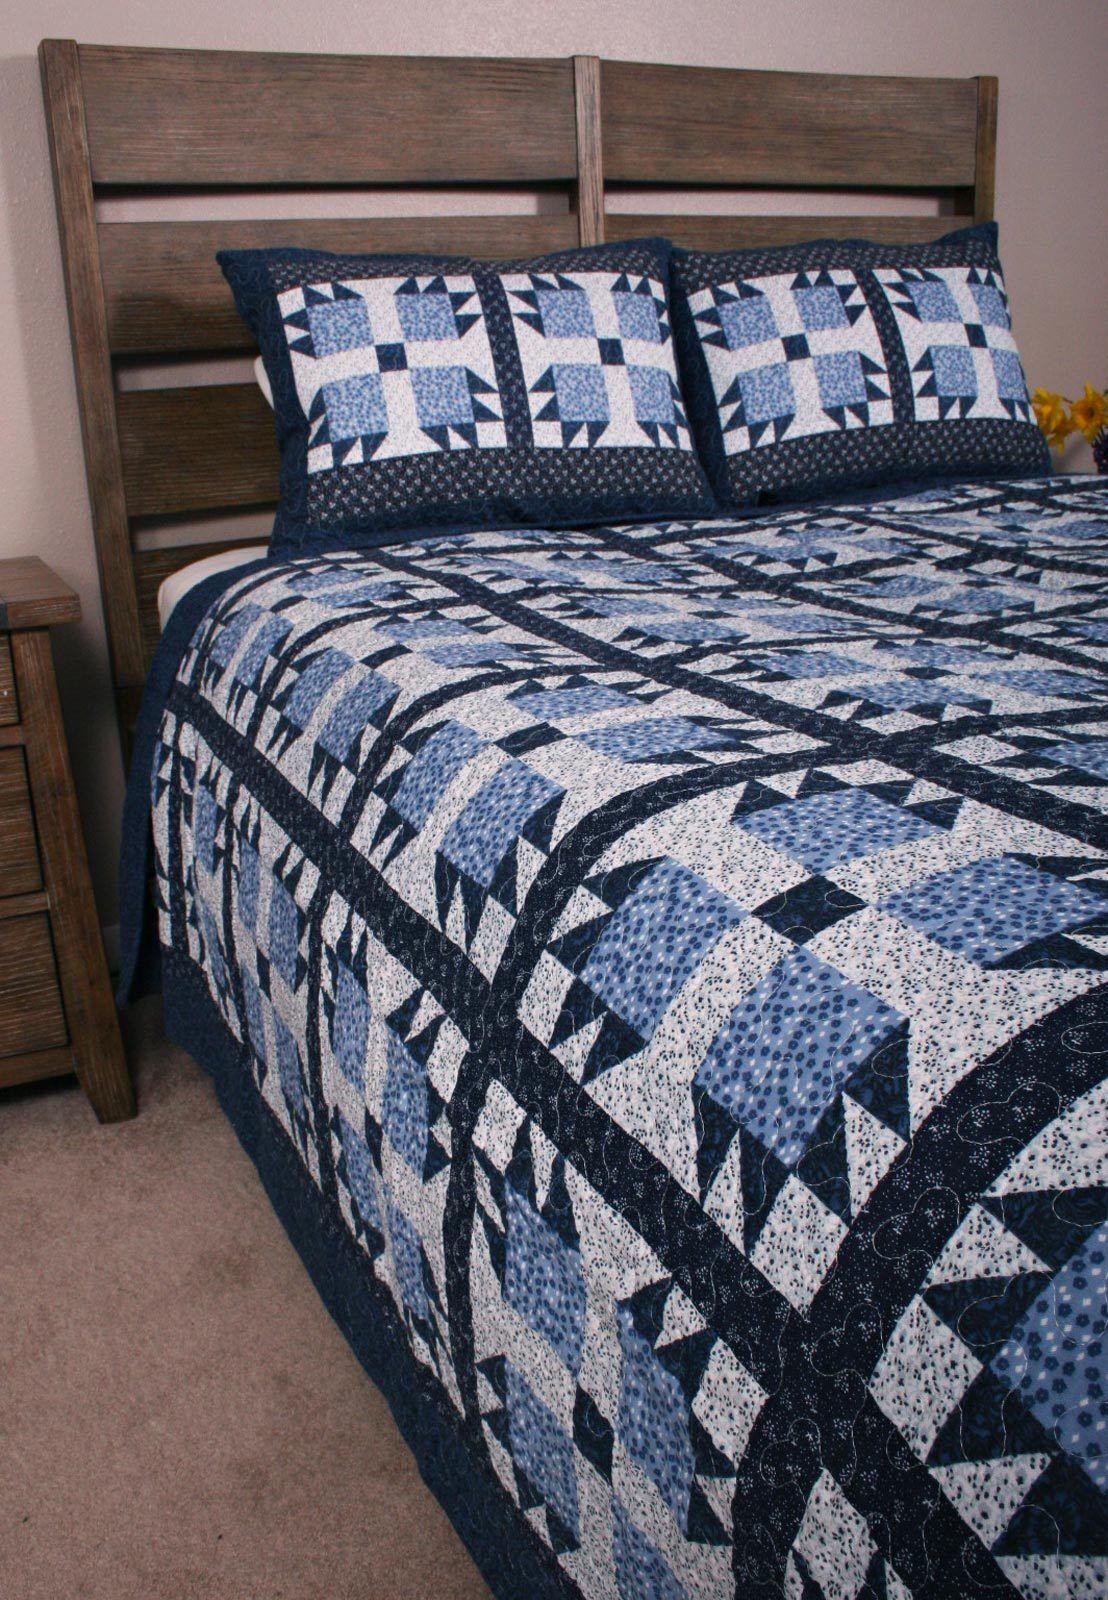 Queen Quilt Set bluee Bear Paw Cottage Cabin Life Garden Floral Bedding